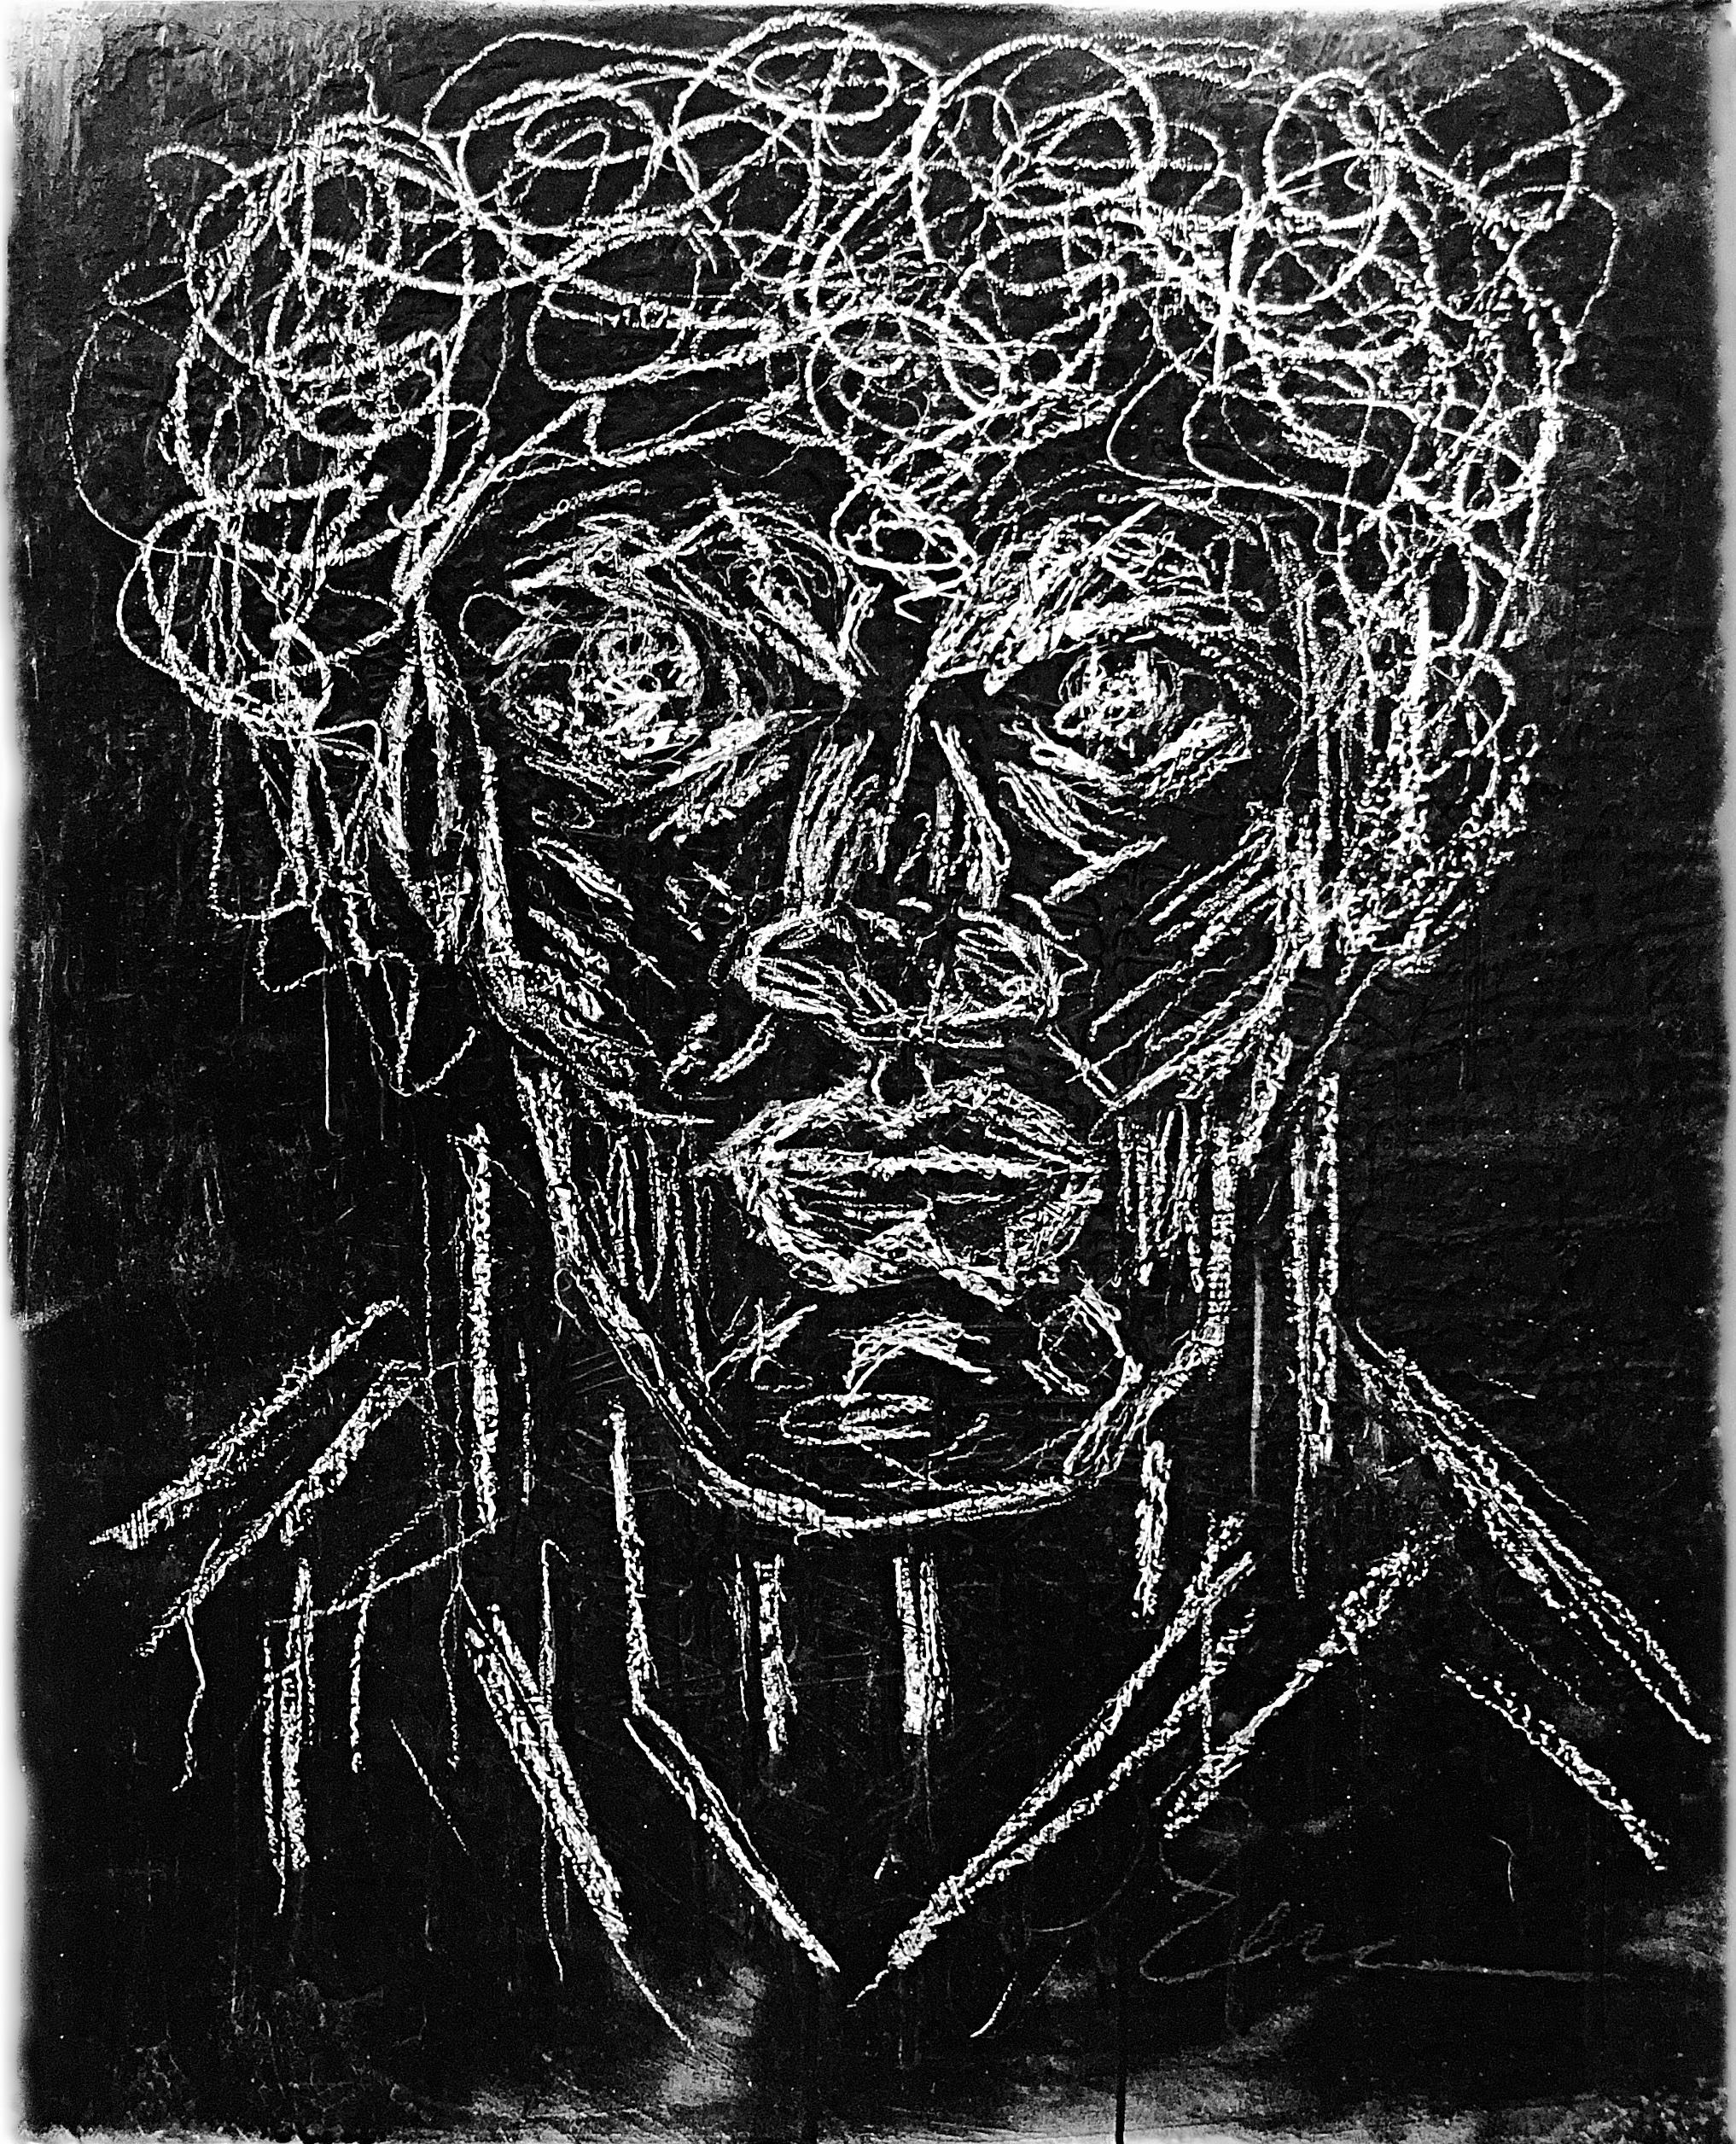 Self Portrait (24x30)